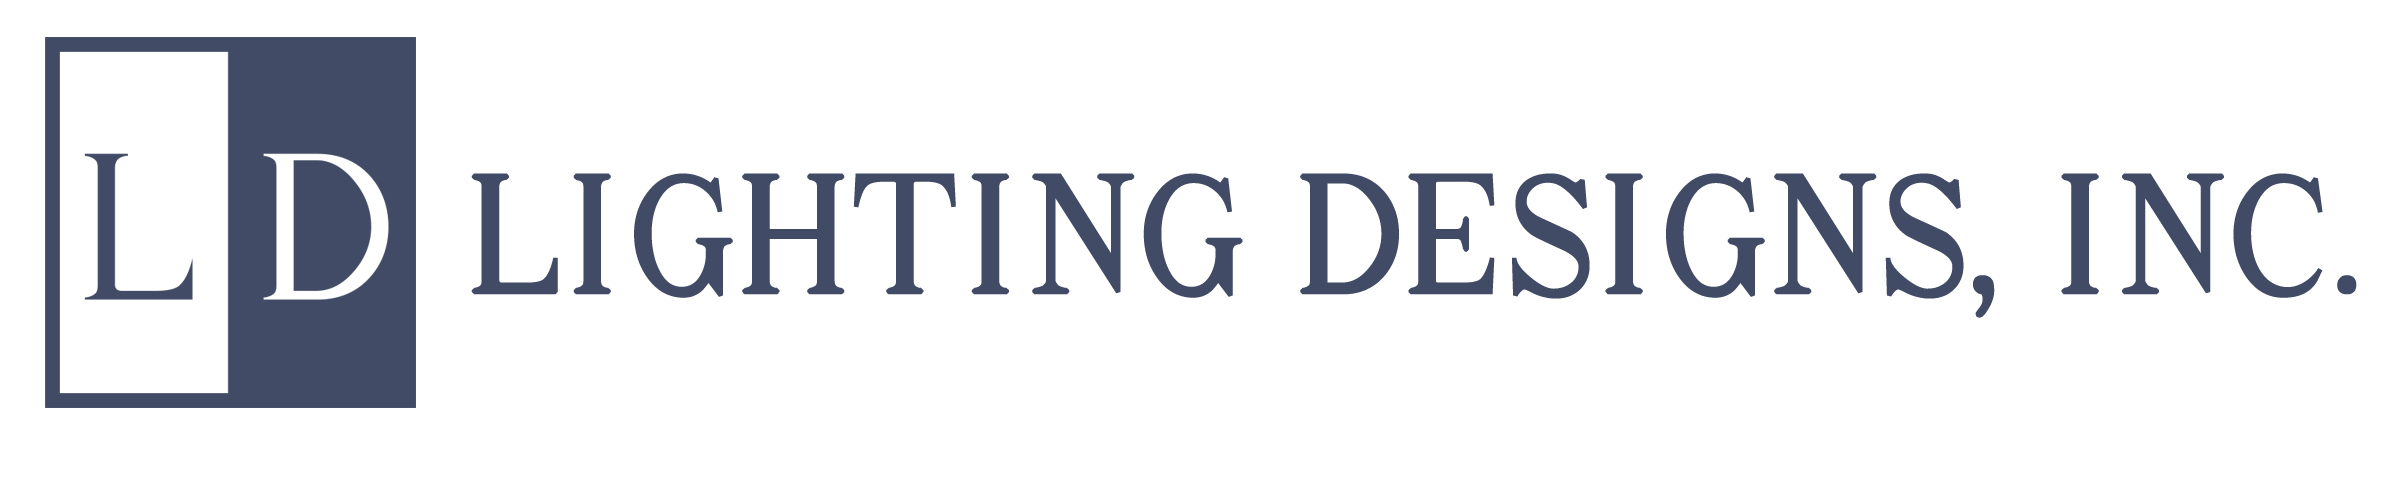 lightingdesigns com